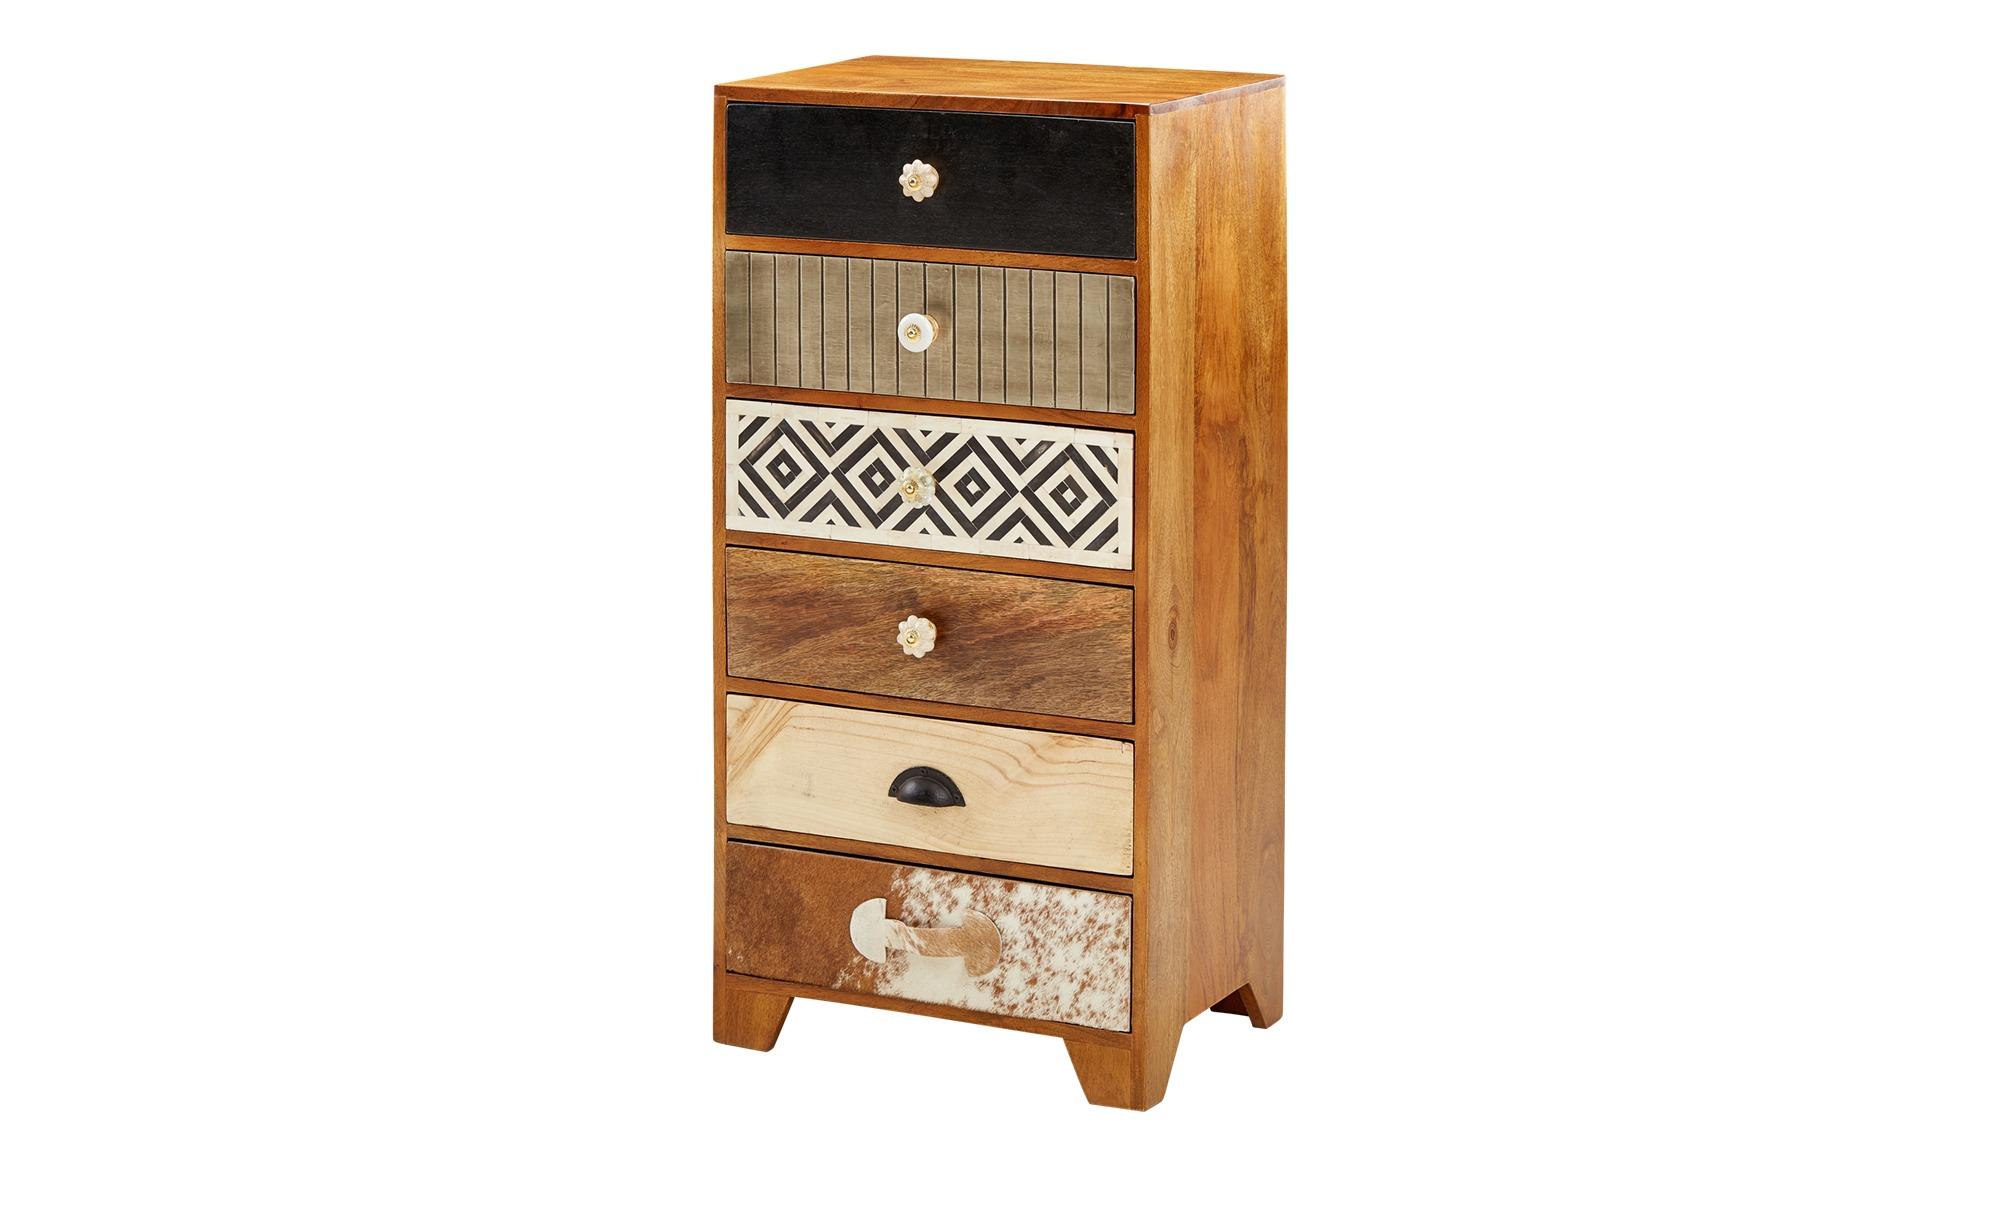 kommode breite 50 cm kommode modena breite 50 cm h he 120. Black Bedroom Furniture Sets. Home Design Ideas